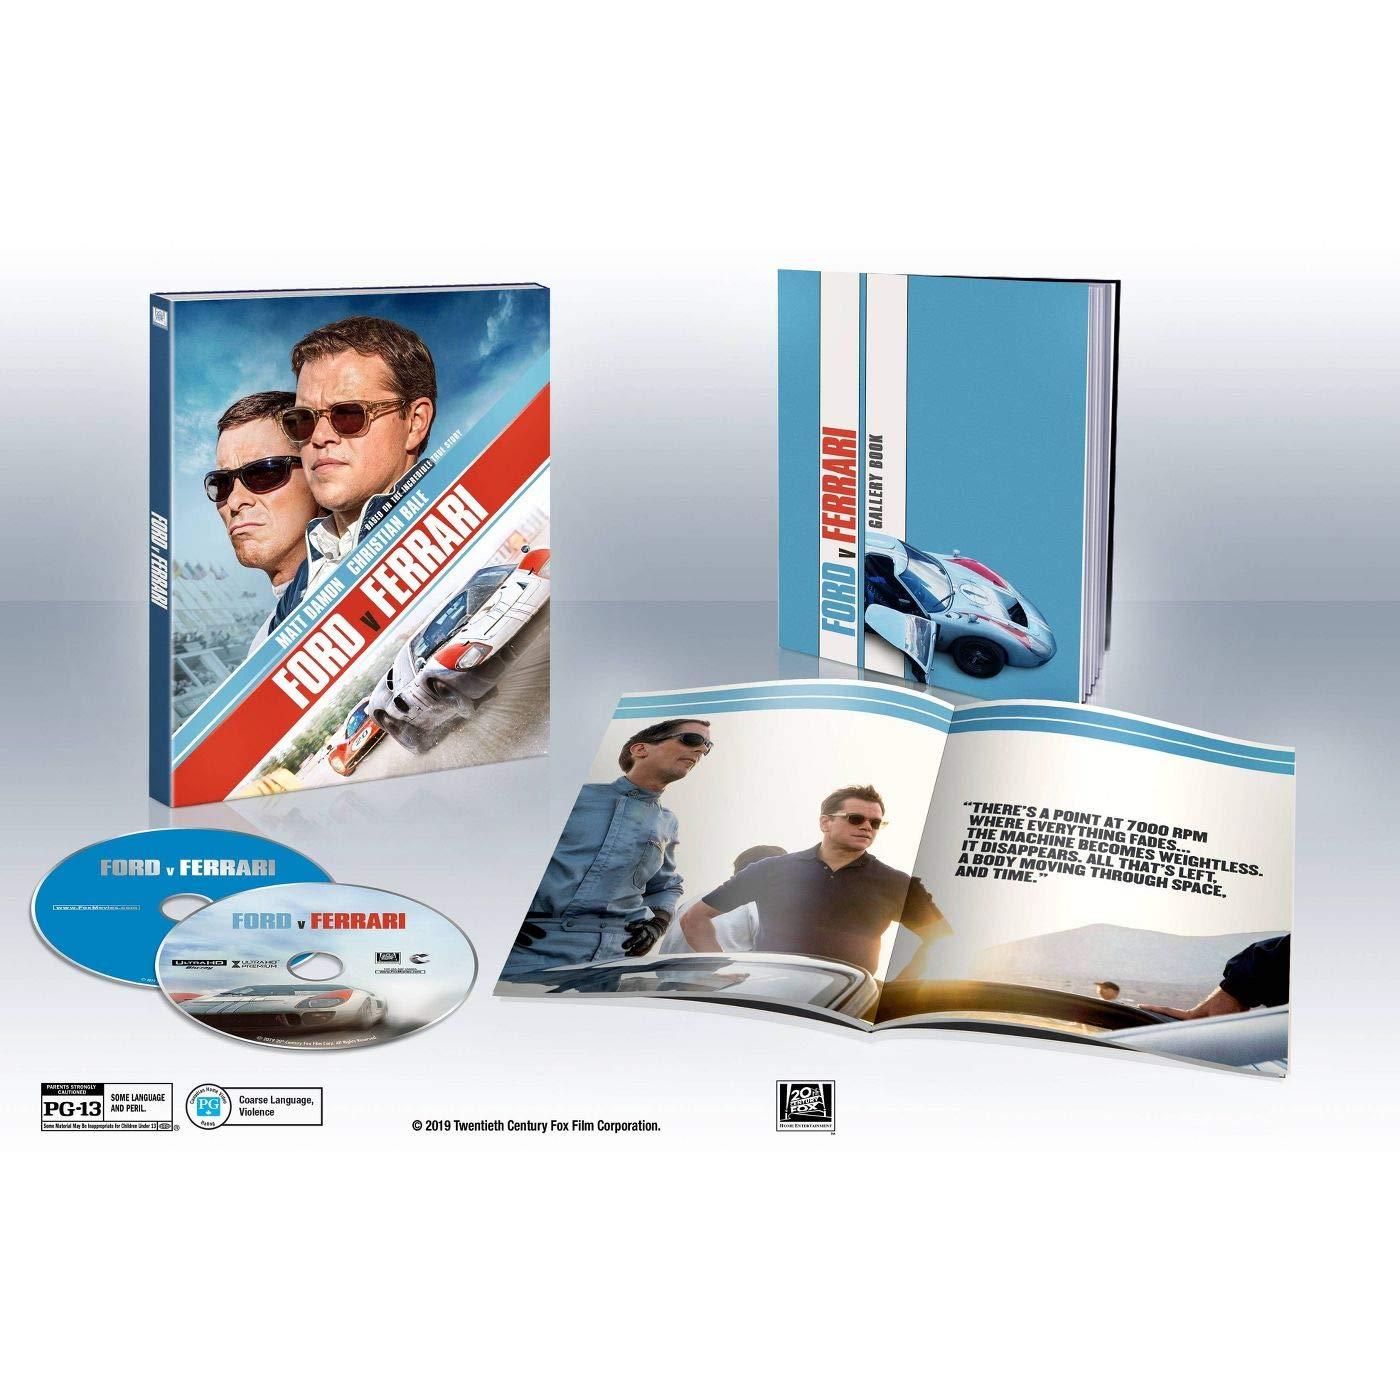 Amazon Com Ford V Ferrari Digipack 4k Uhd Blu Ray Digipack With Gallery Book Movies Tv